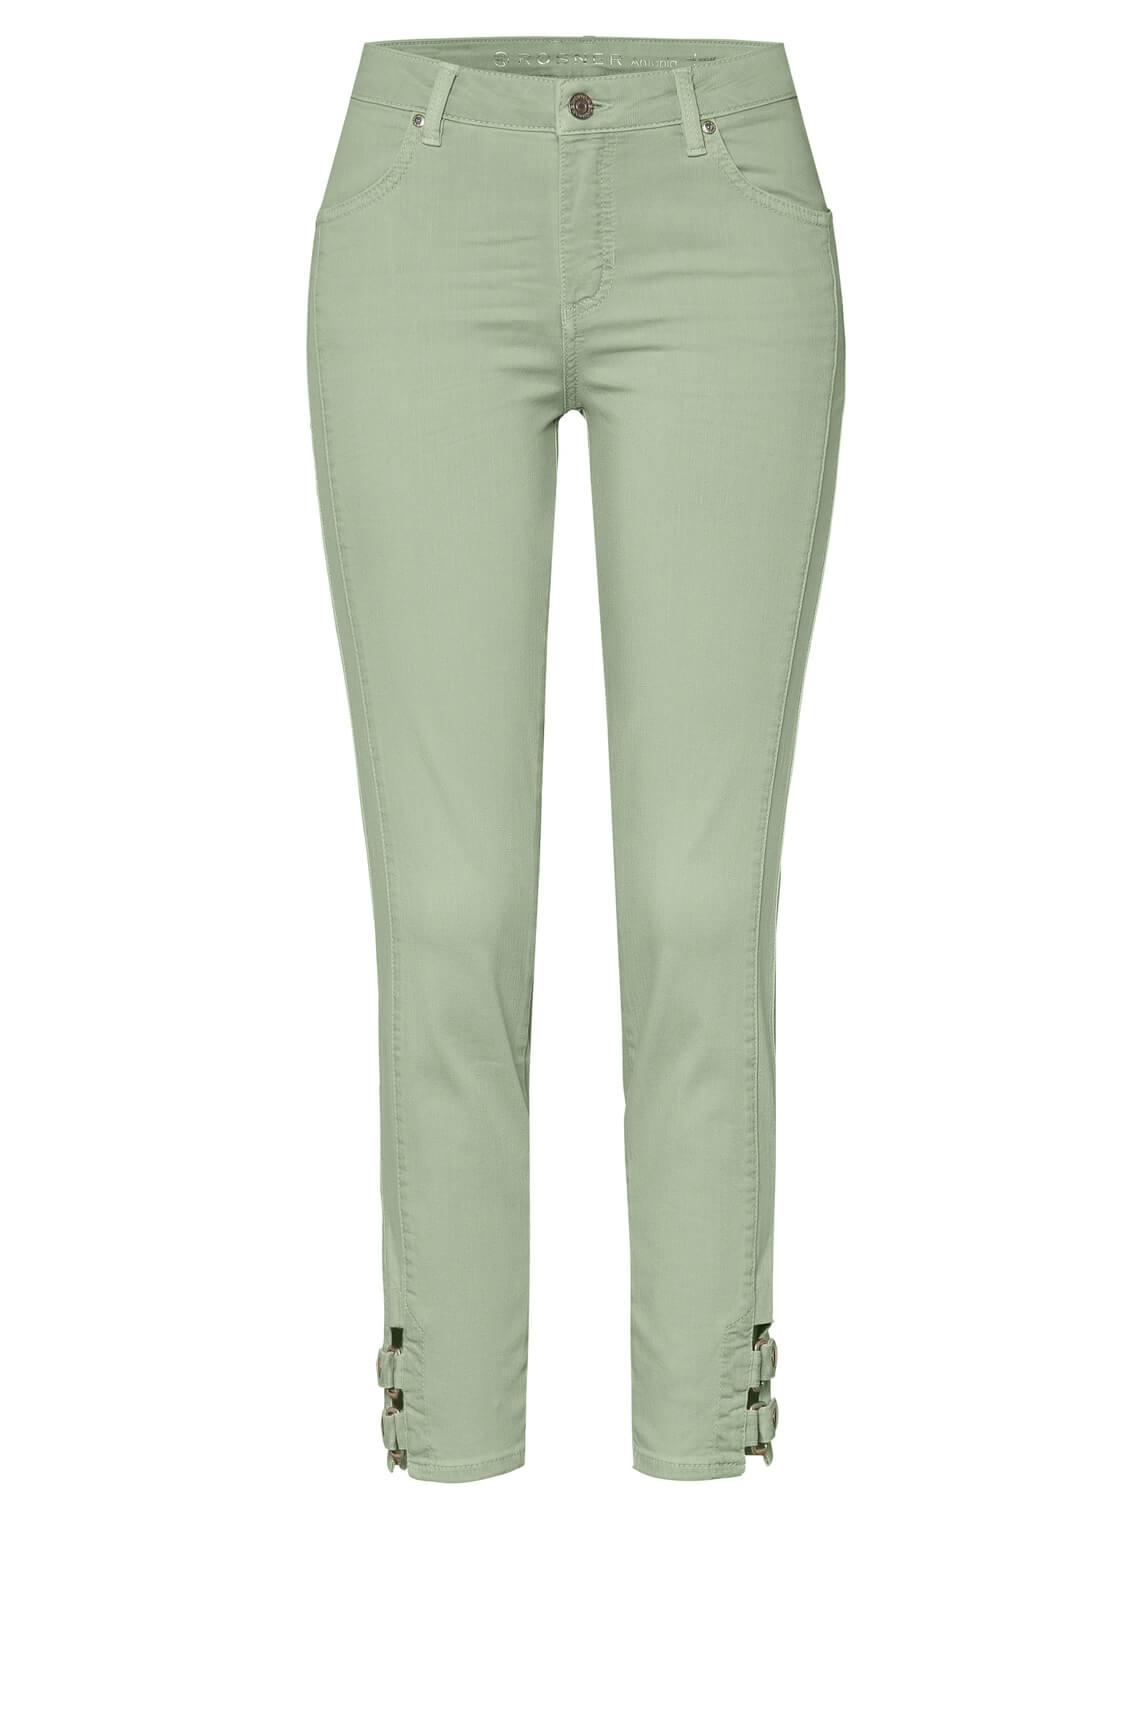 Rosner Dames Antonia jeans met gesp groen